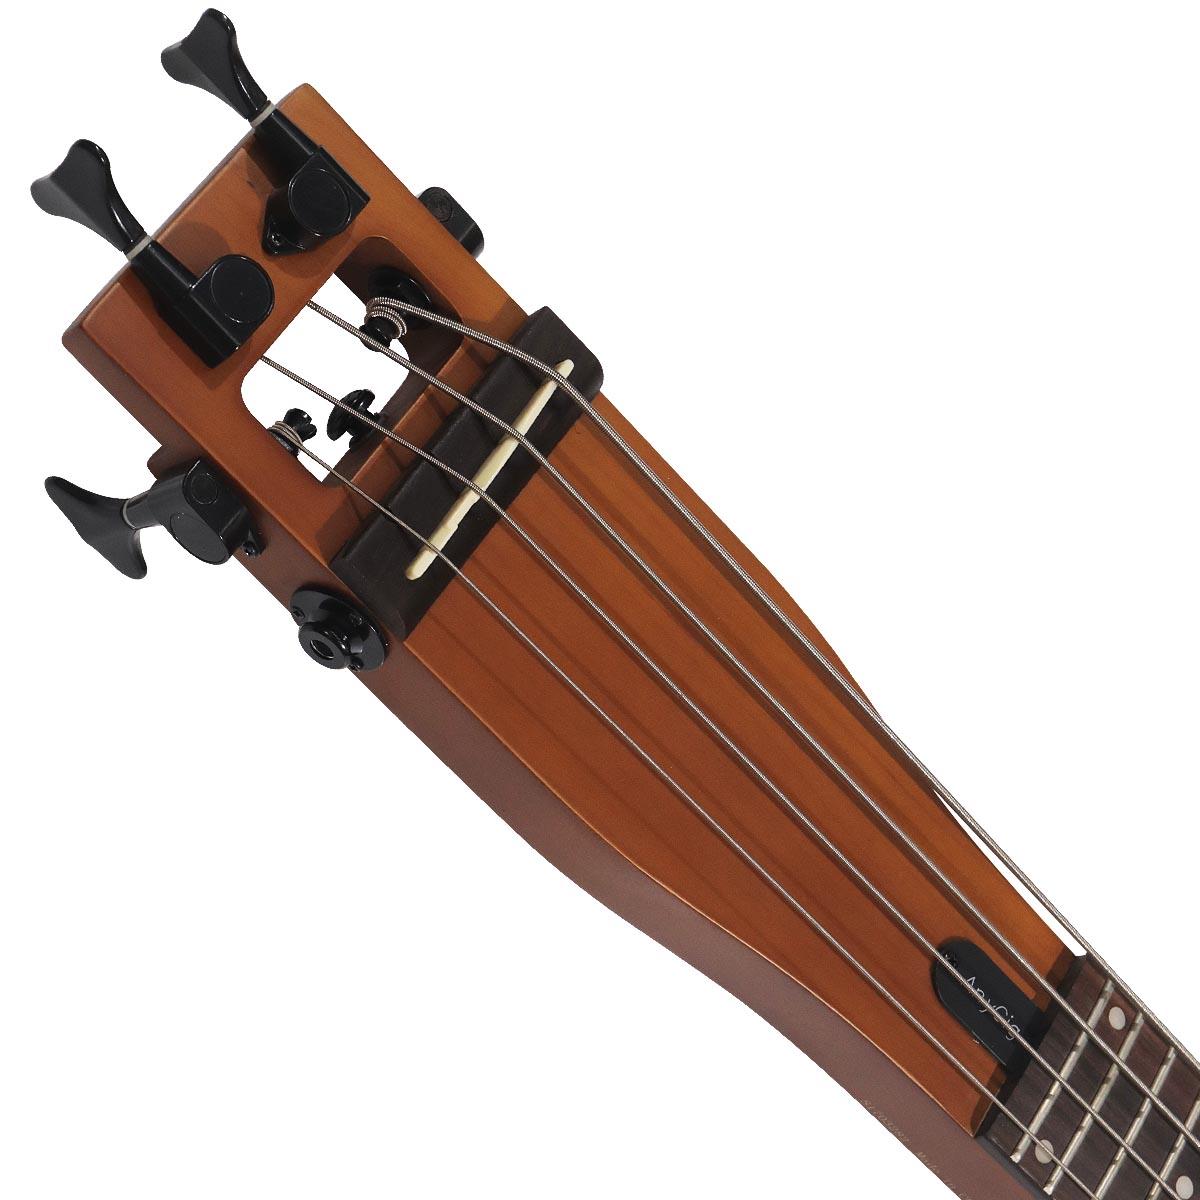 anygig agb full scale 34 travelerer 4 strings bass guitar backpacker protable ebay. Black Bedroom Furniture Sets. Home Design Ideas